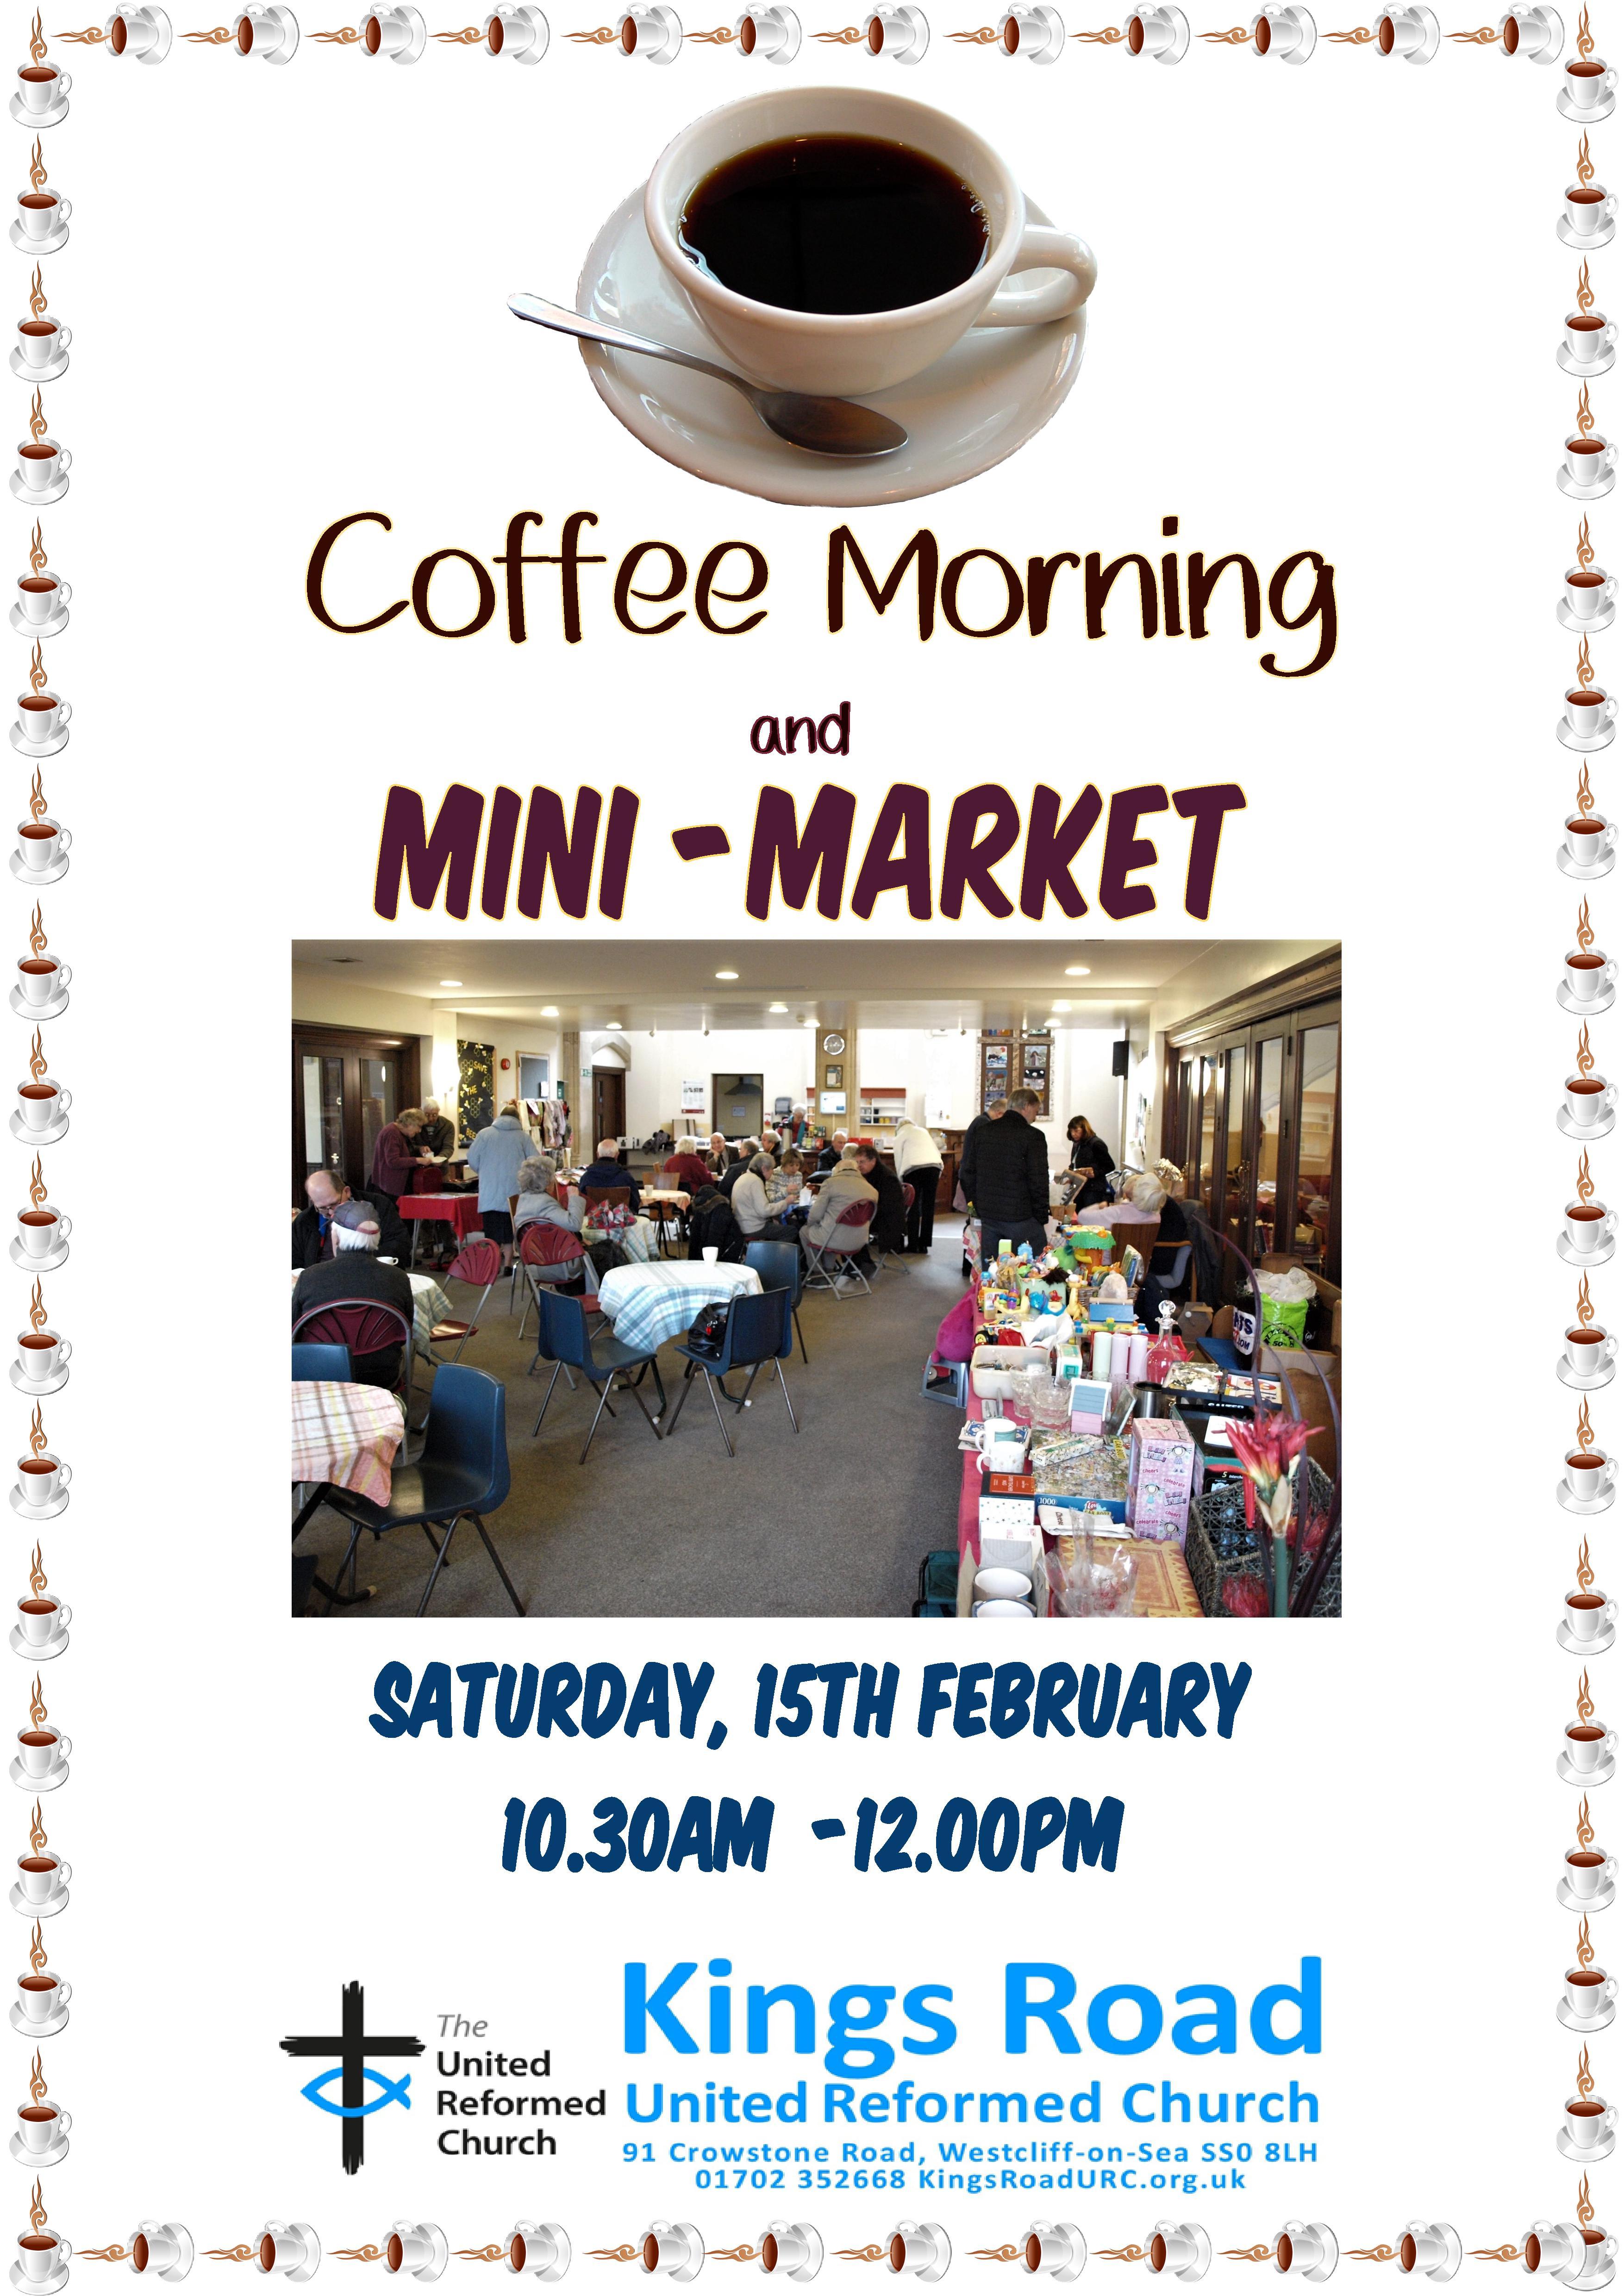 Coffee Morning and Mini Market